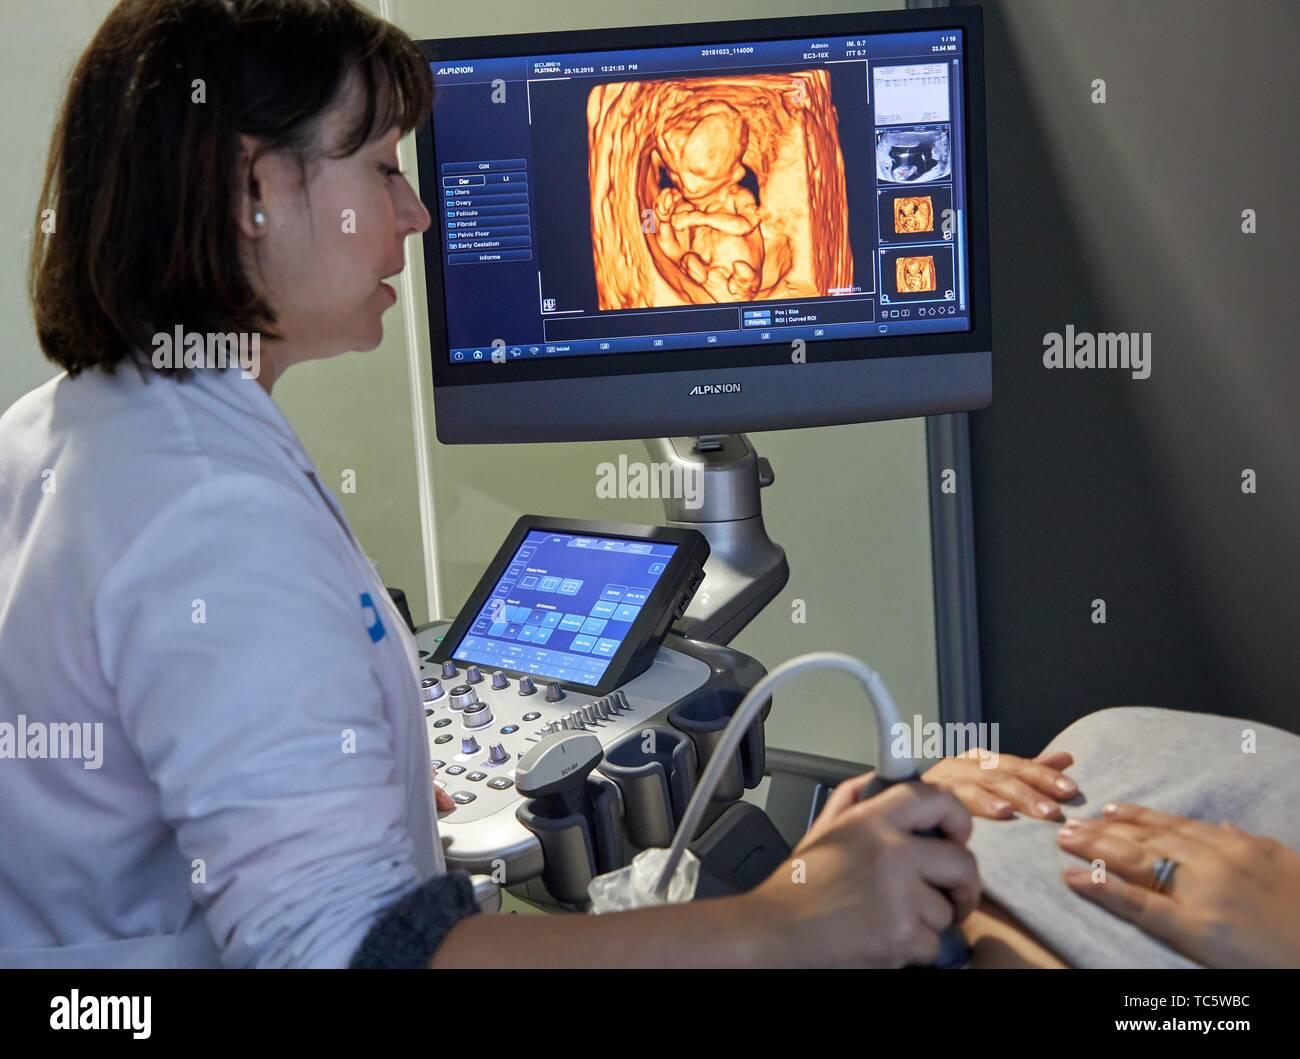 ultrasound diagnostic systems, Ultrasound 4d, Hospital, Donostia, San Sebastian, Gipuzkoa, Basque Country, Spain - Stock Image